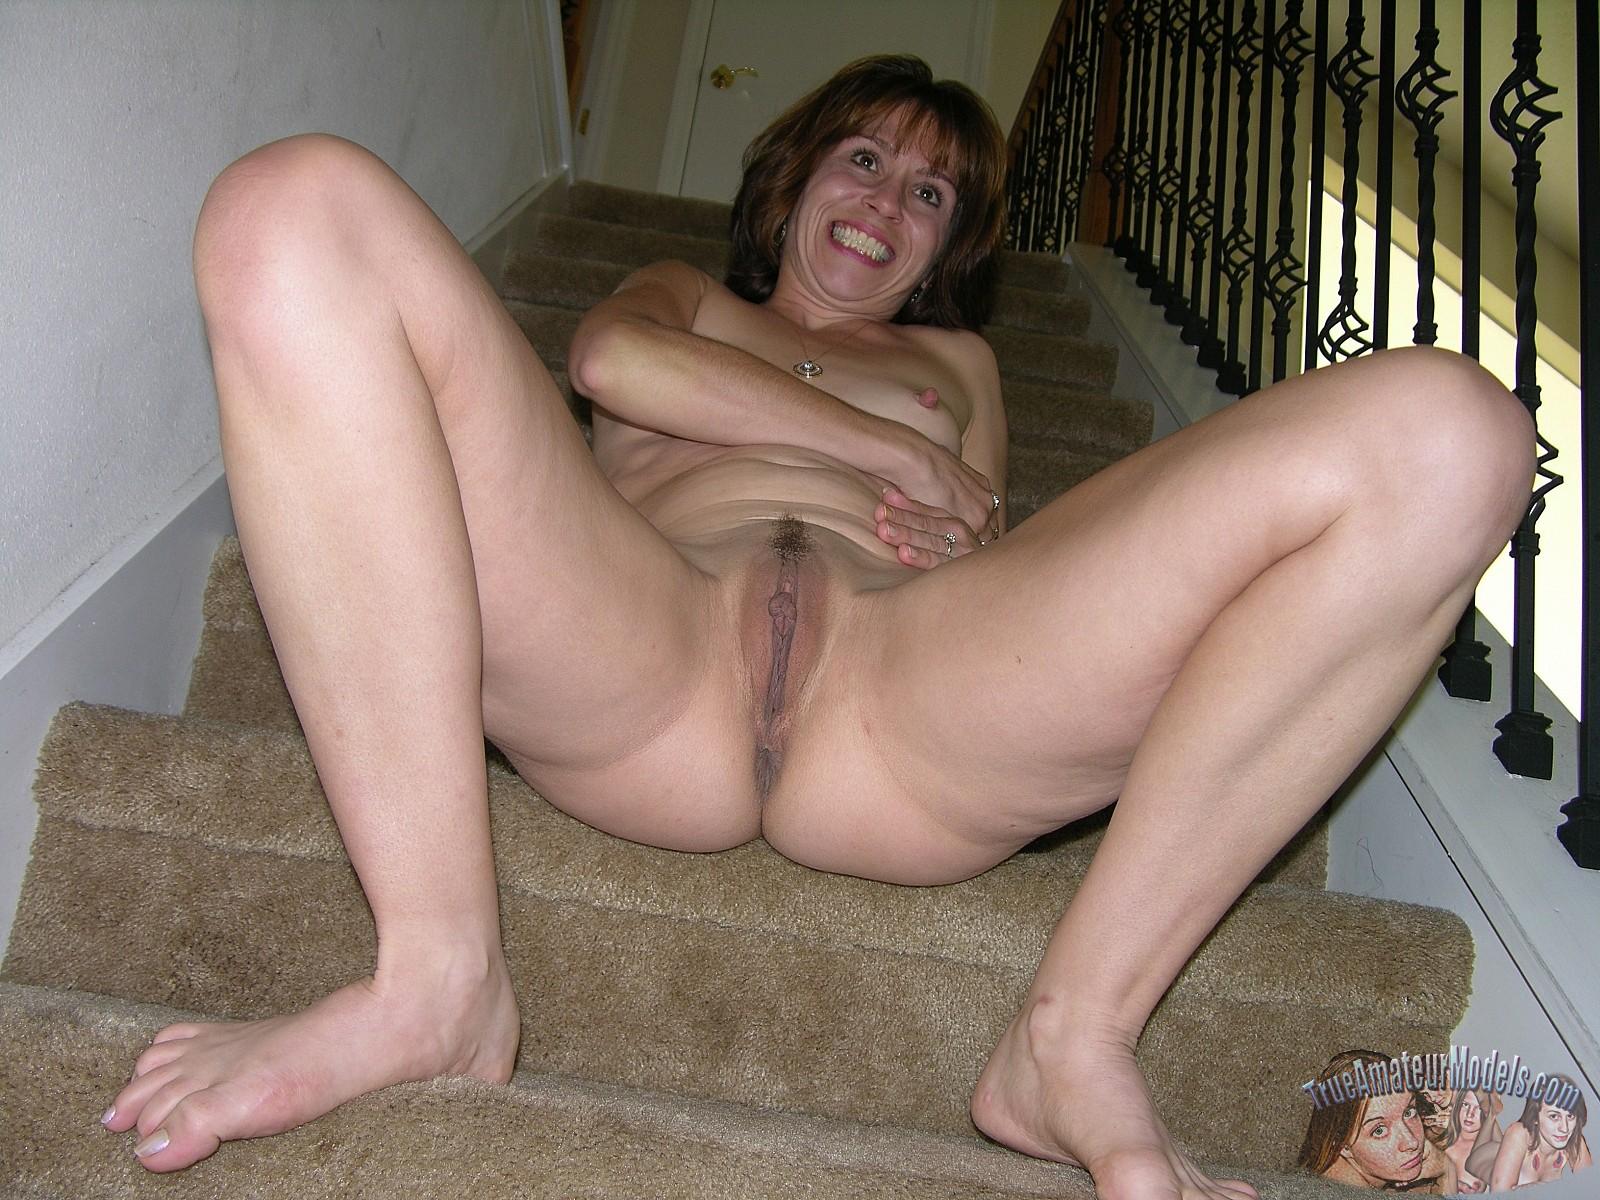 hot nude amateur pics